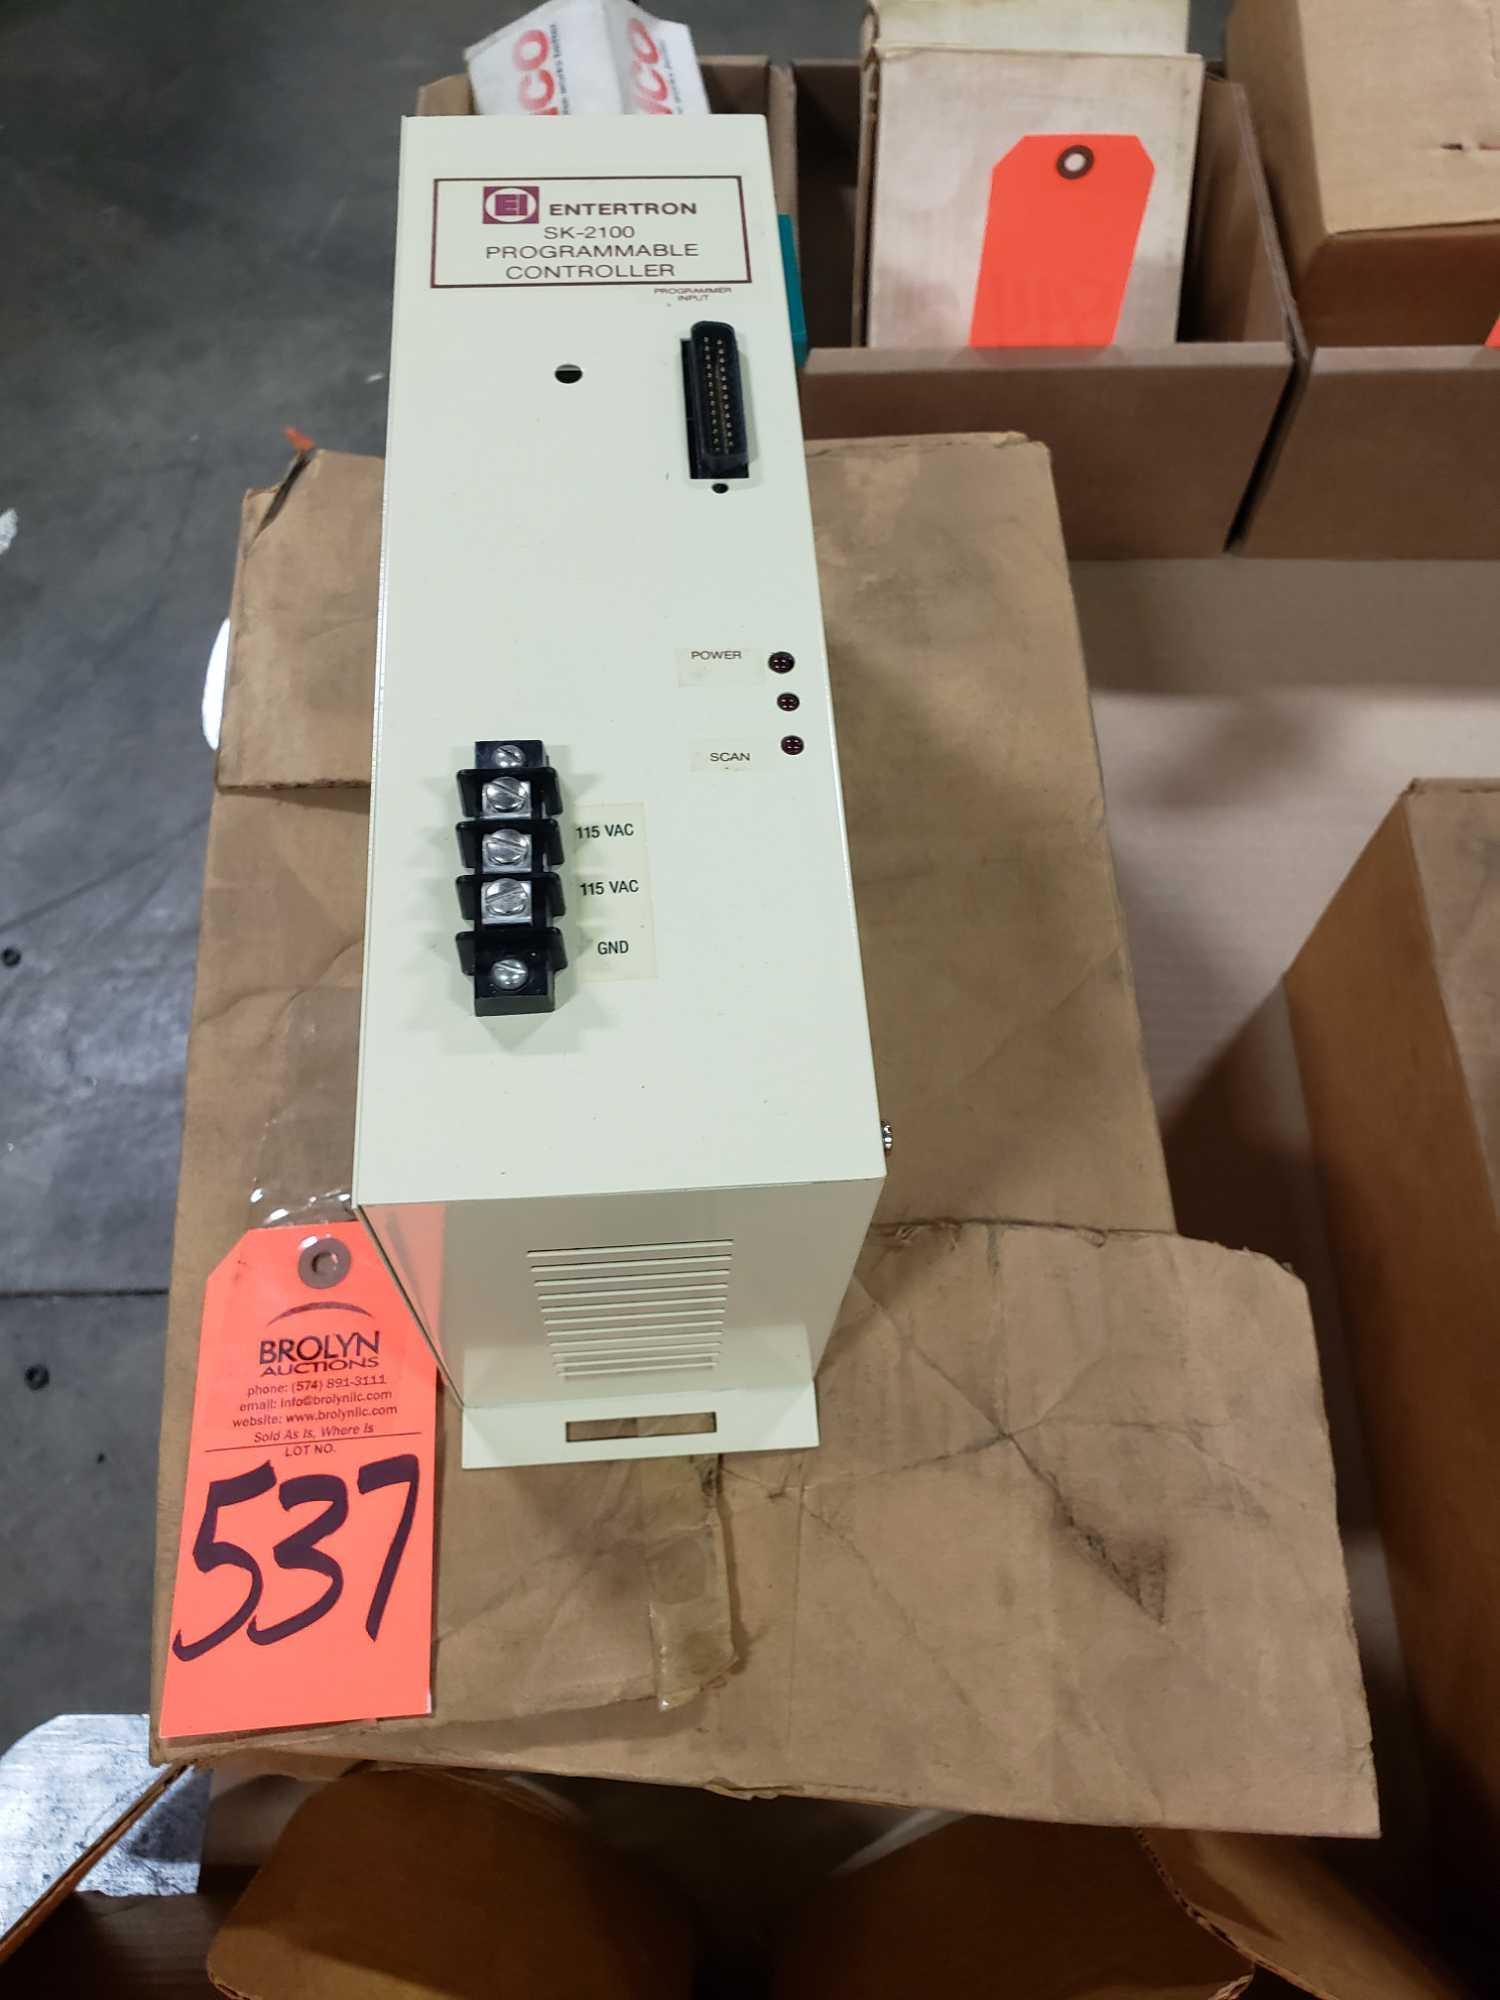 Entertron programmable controller model SK-2100. New in box.